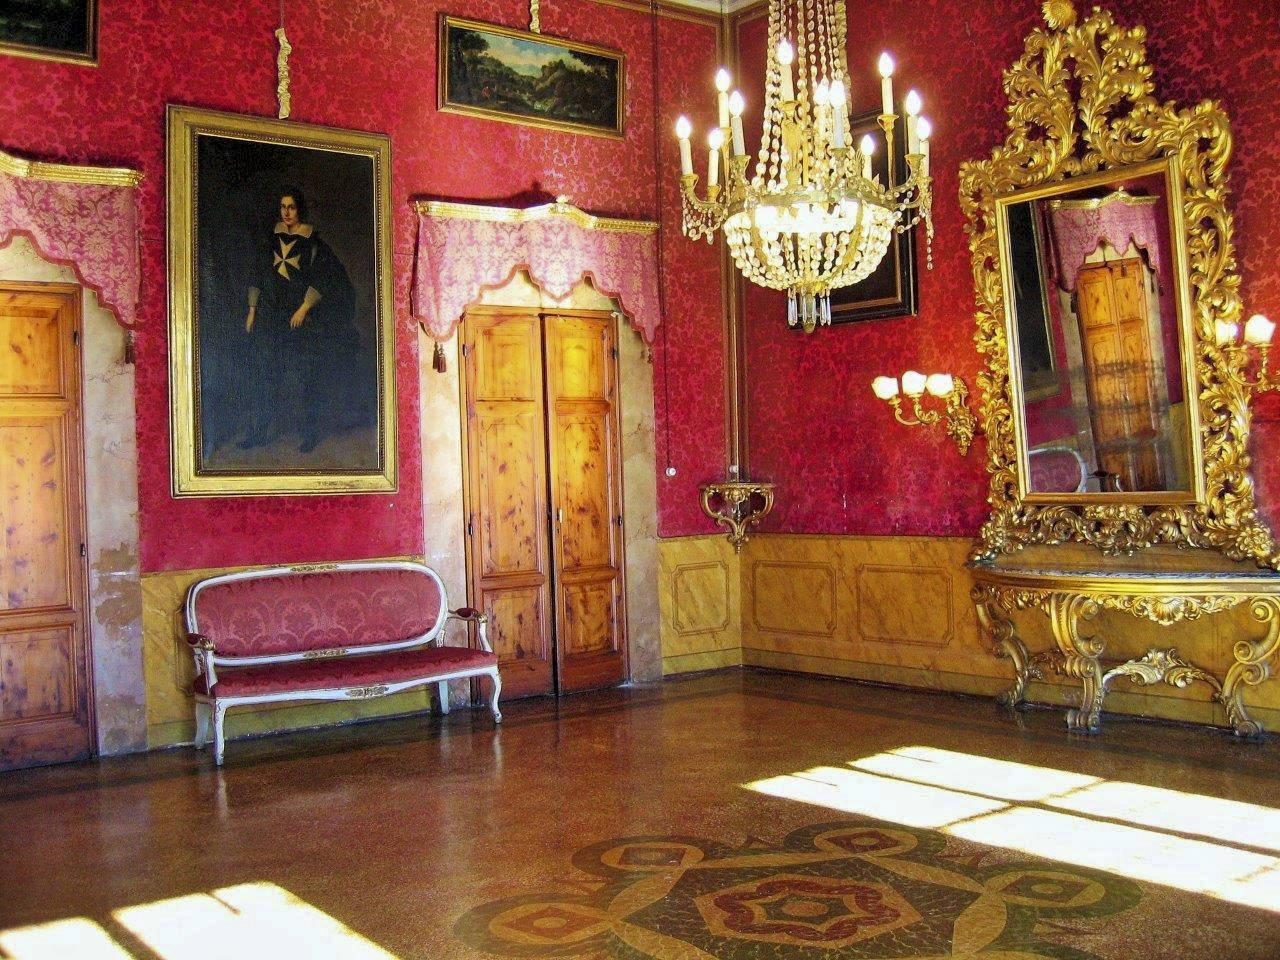 Red hall at Villa di Maiano